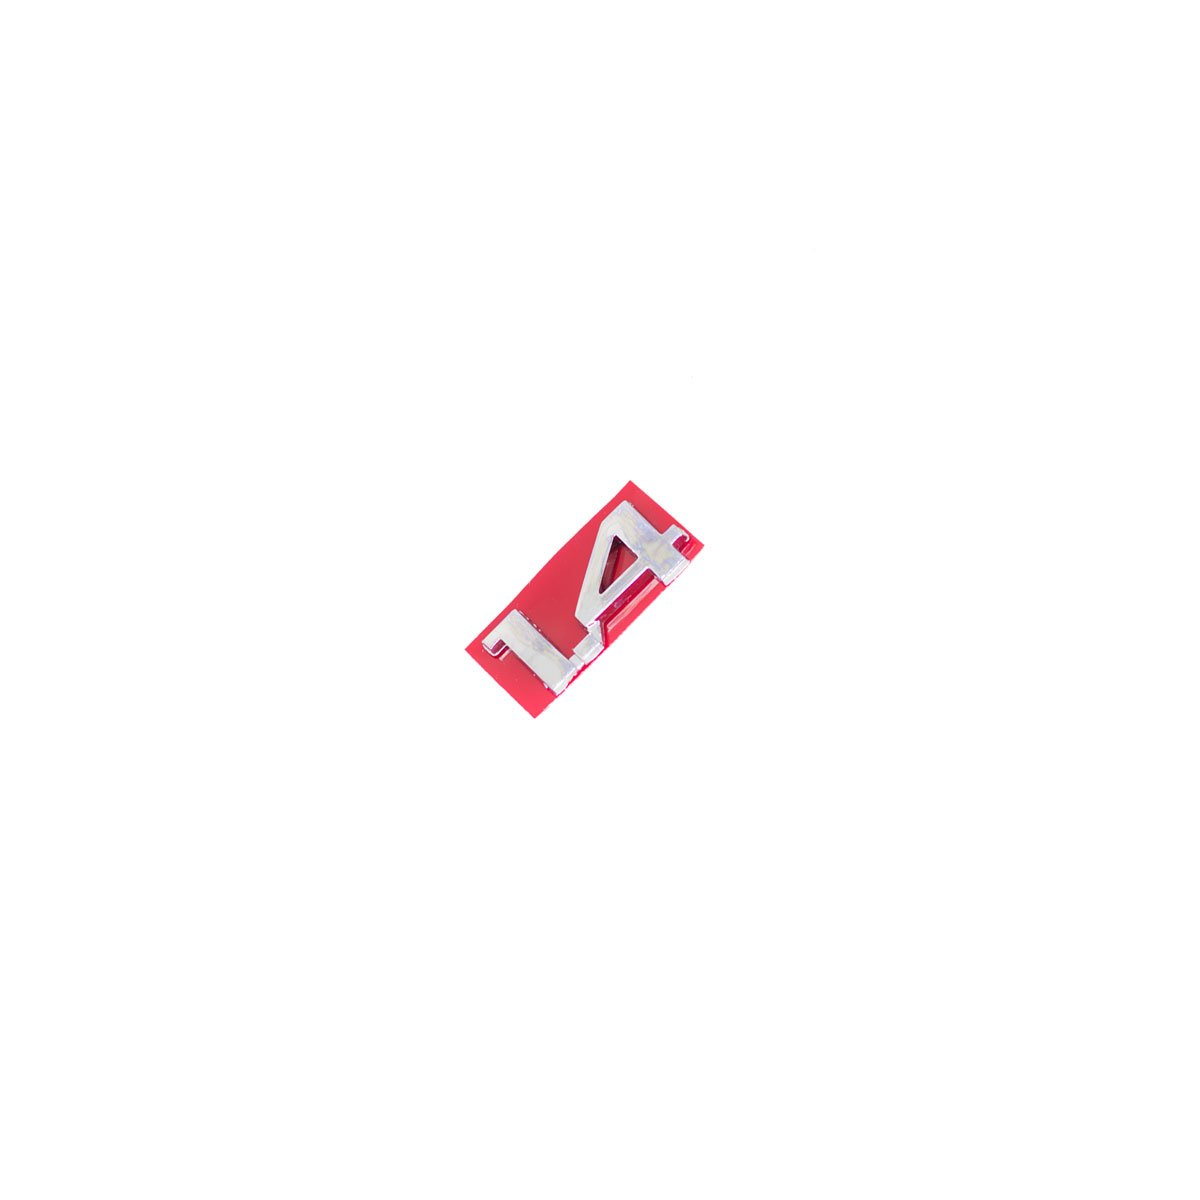 Emblema 1.4(Celta/Corsa 07/)